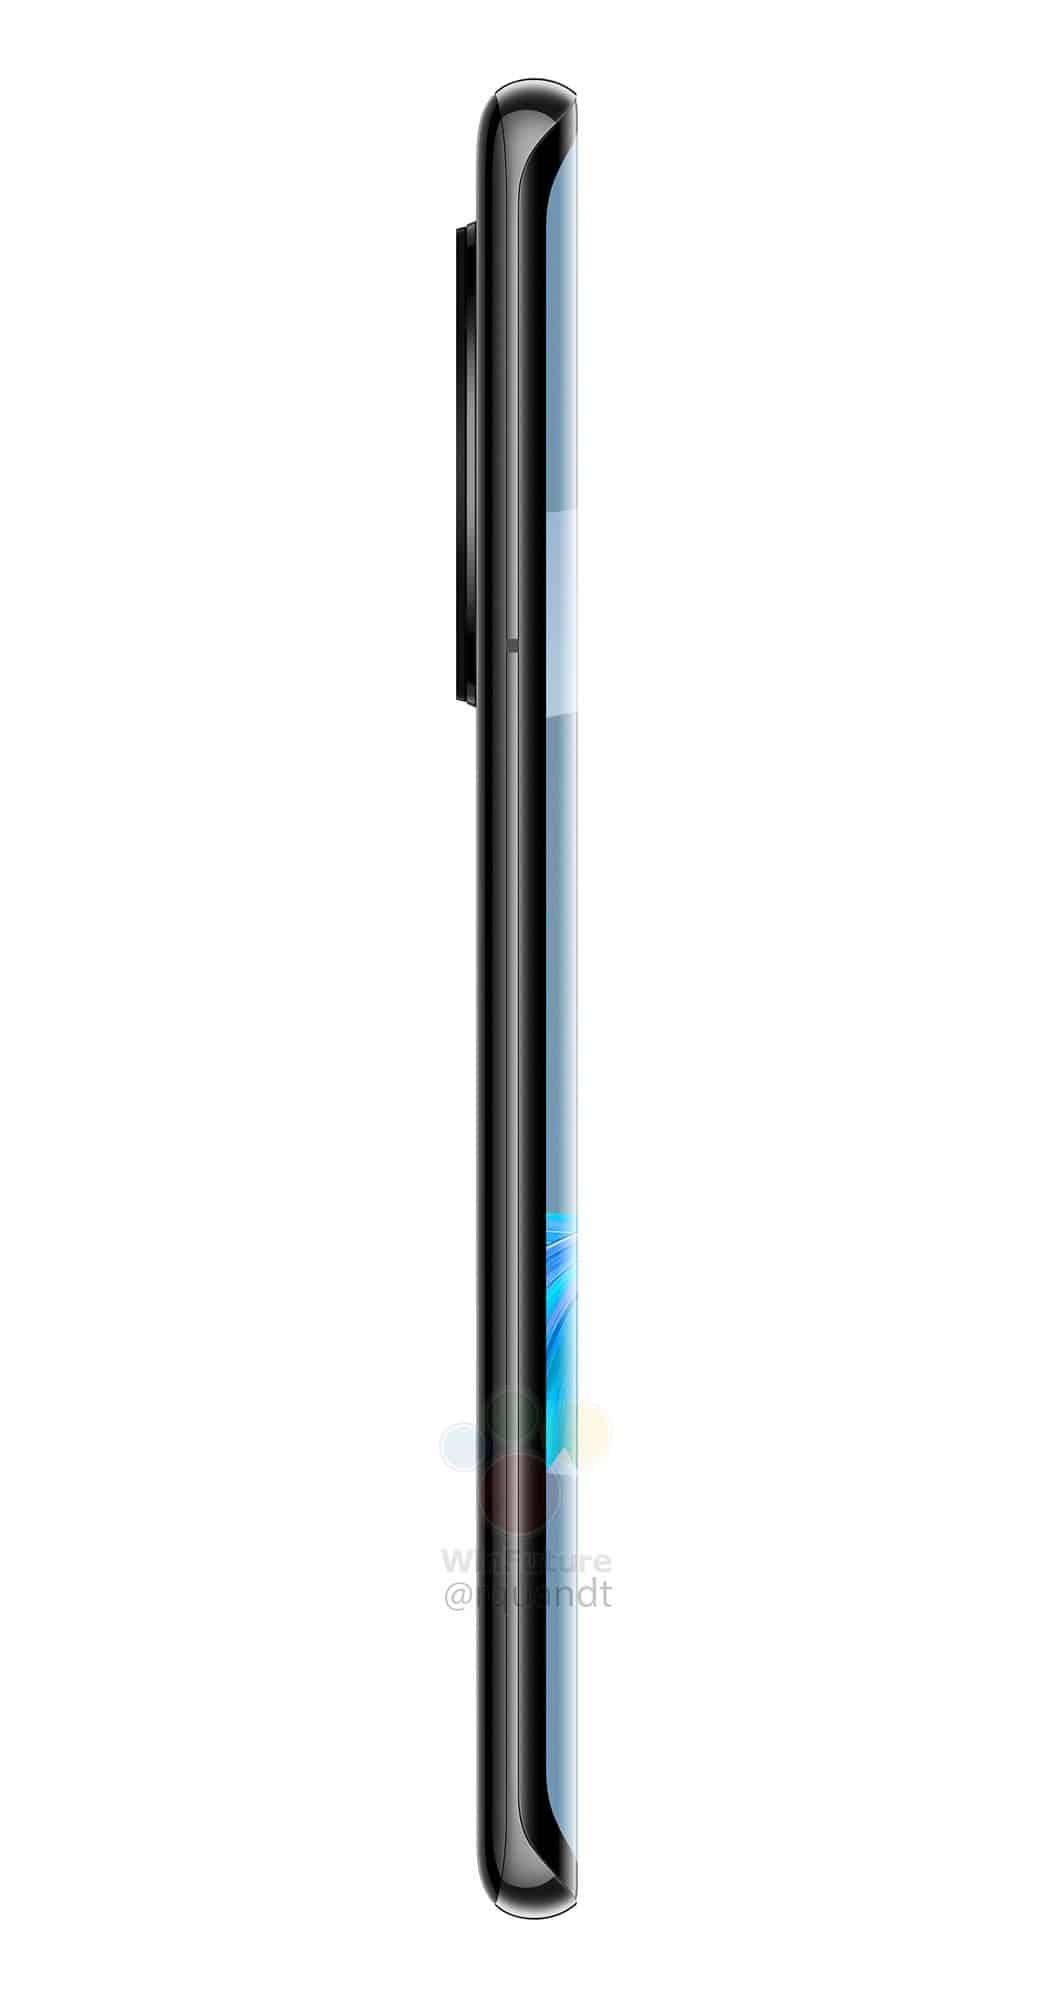 Huawei Mate 40 Pro leak 6